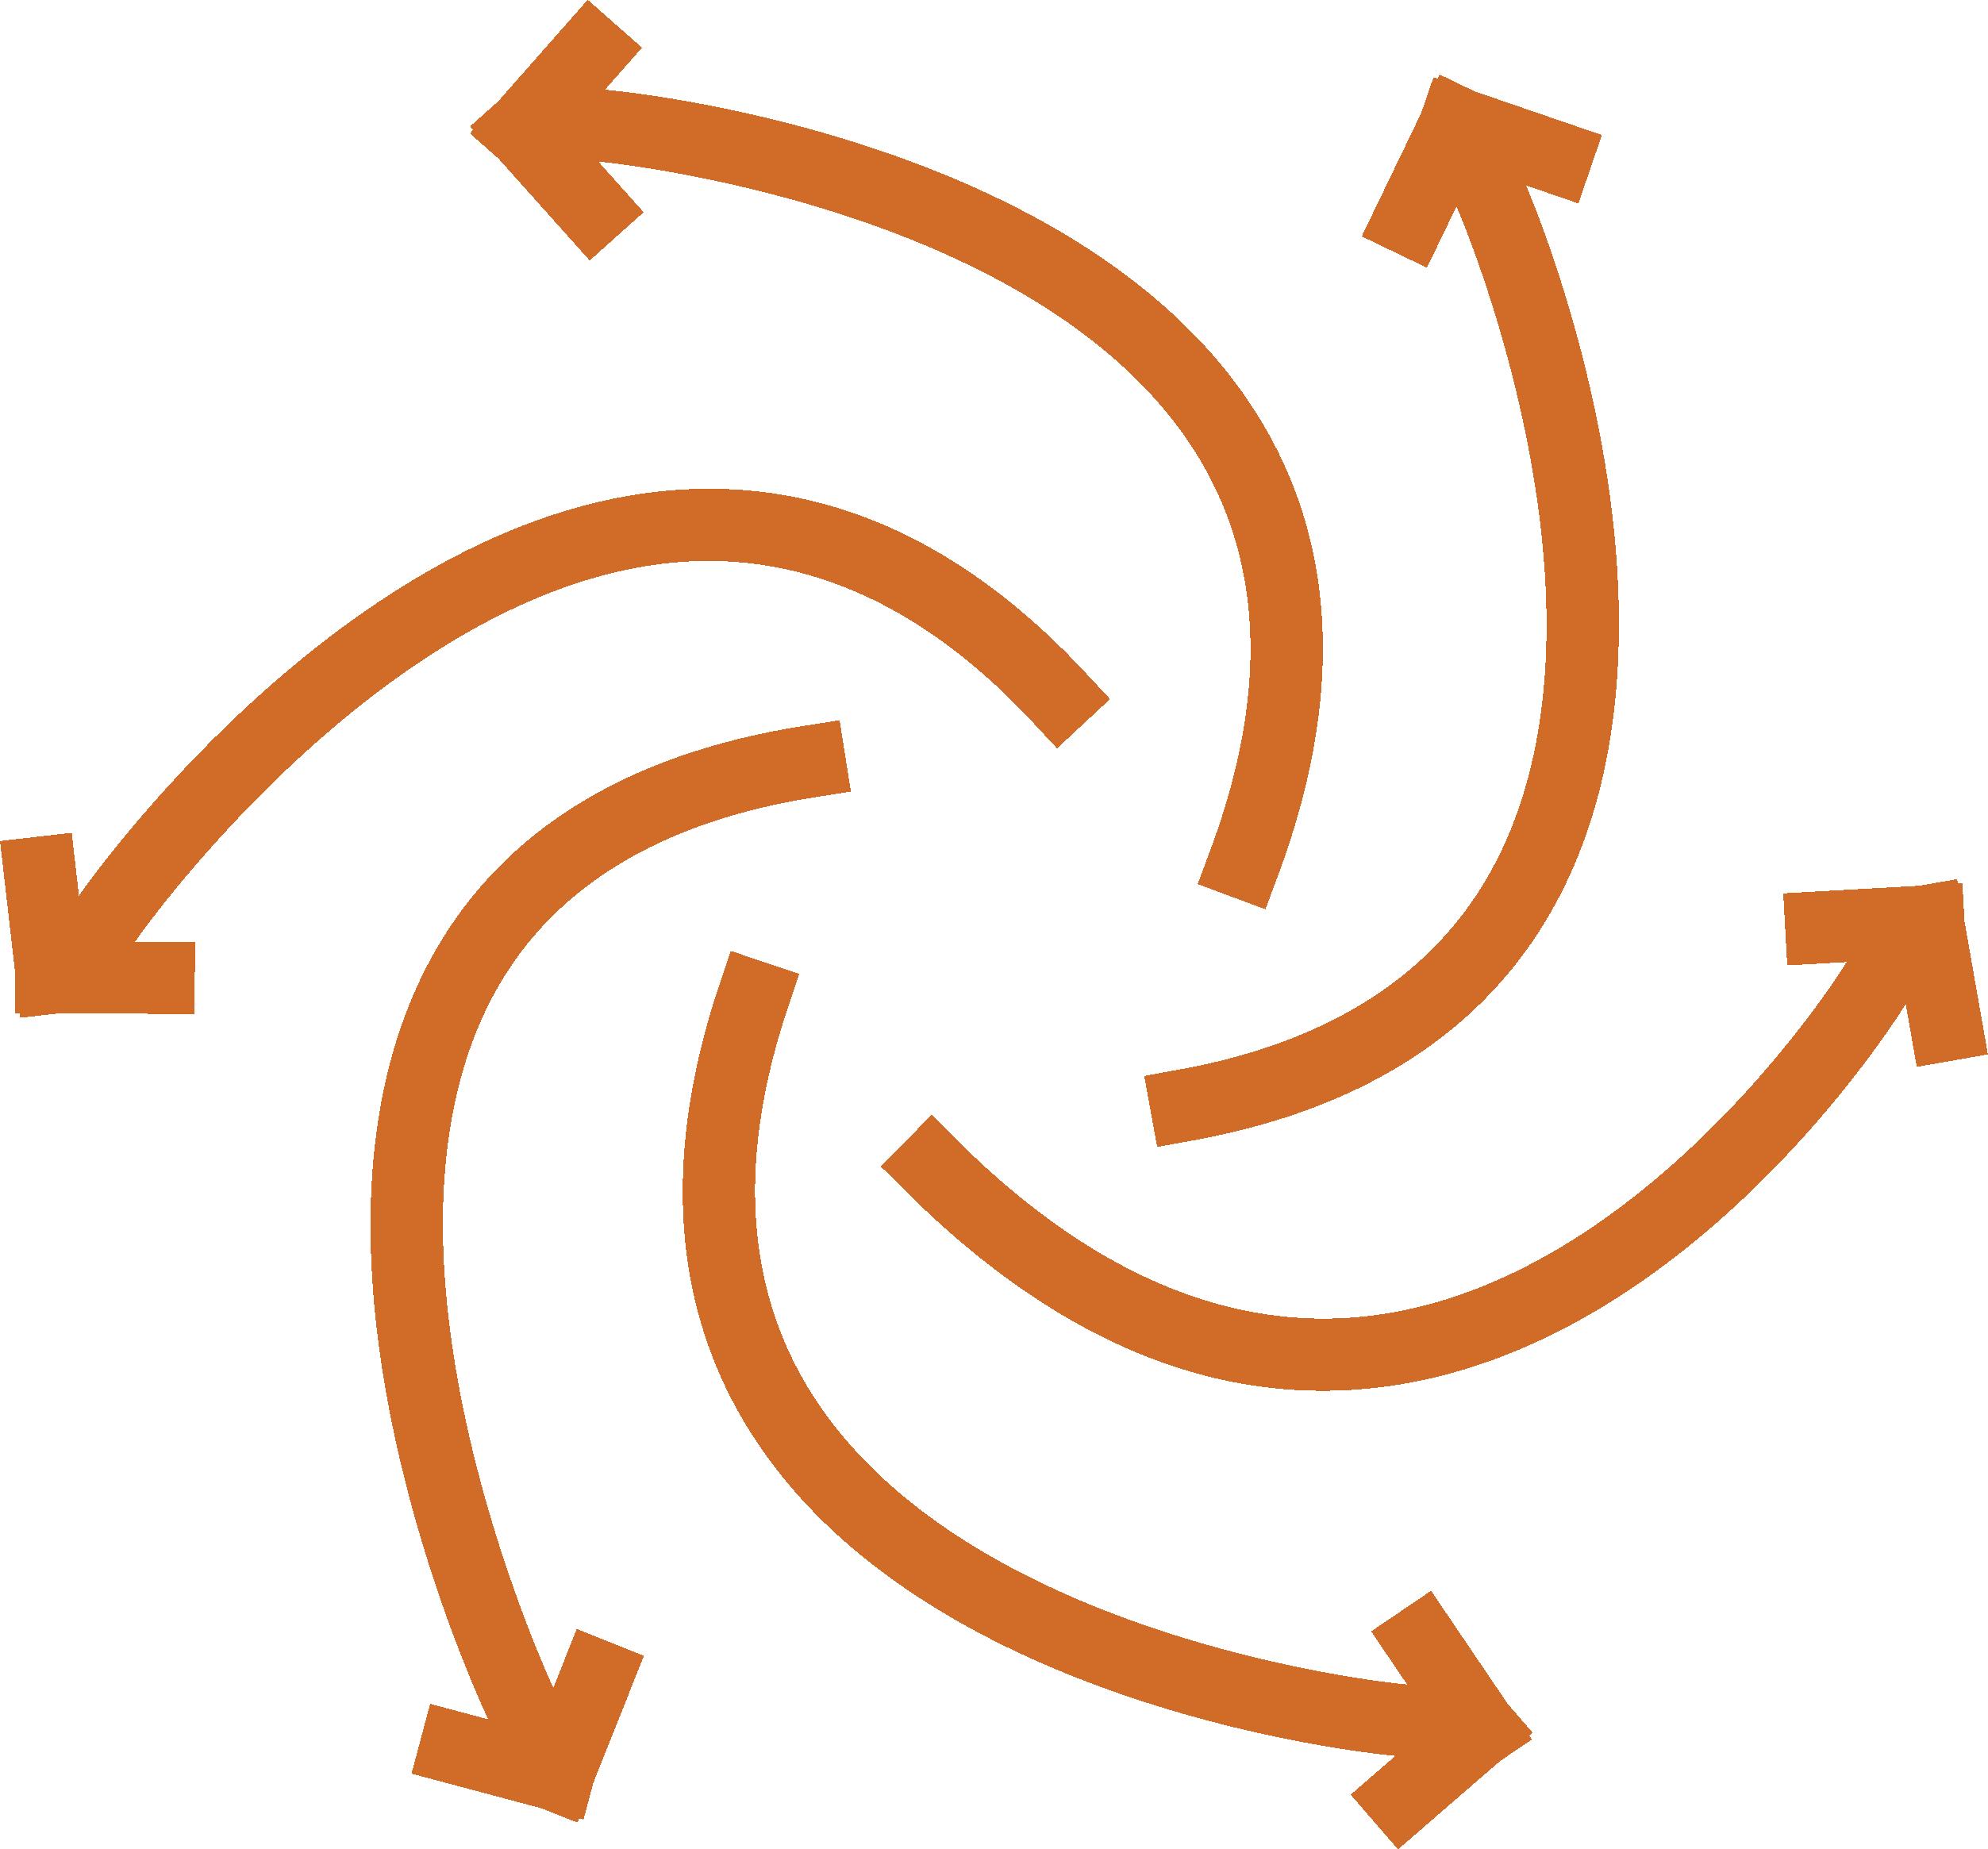 circular outward facing orange arrows